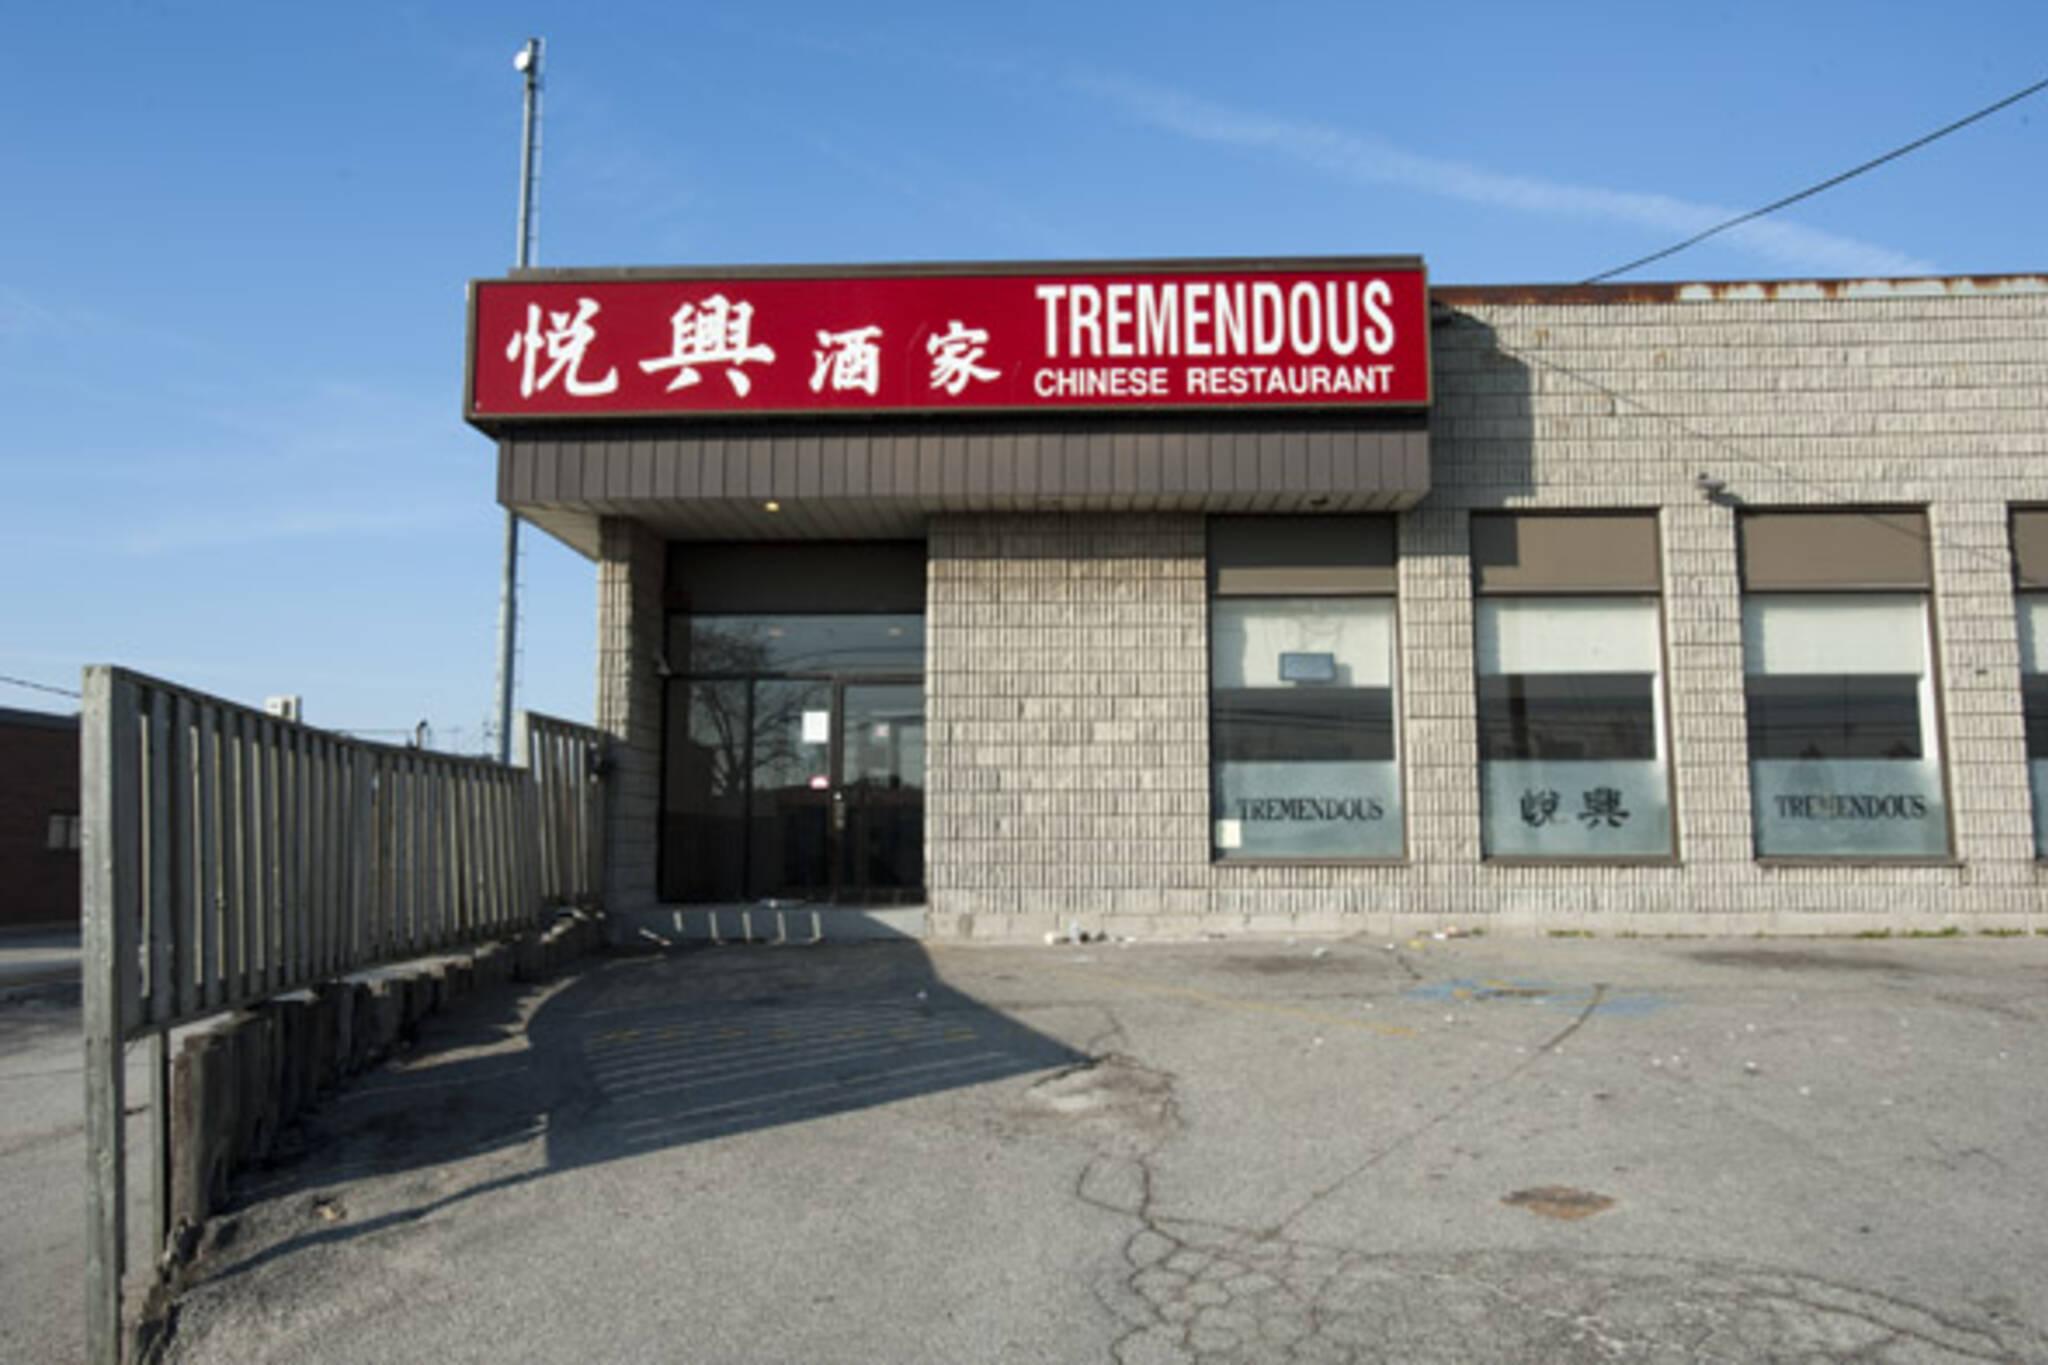 Tremendous Chinese Restaurant